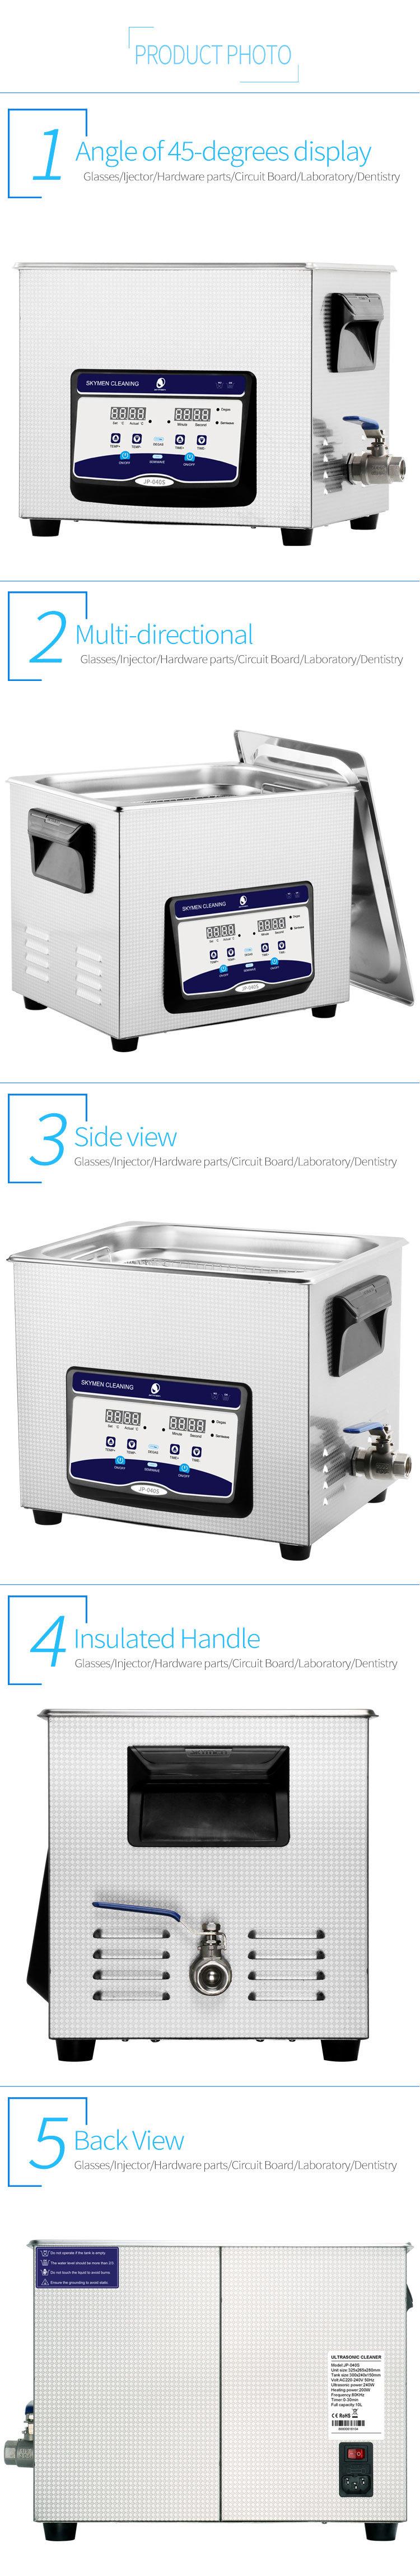 Skymen Digital Heated Ultrasonic Cleaner with Adjustable Ultrasonic Power (JP-040S)